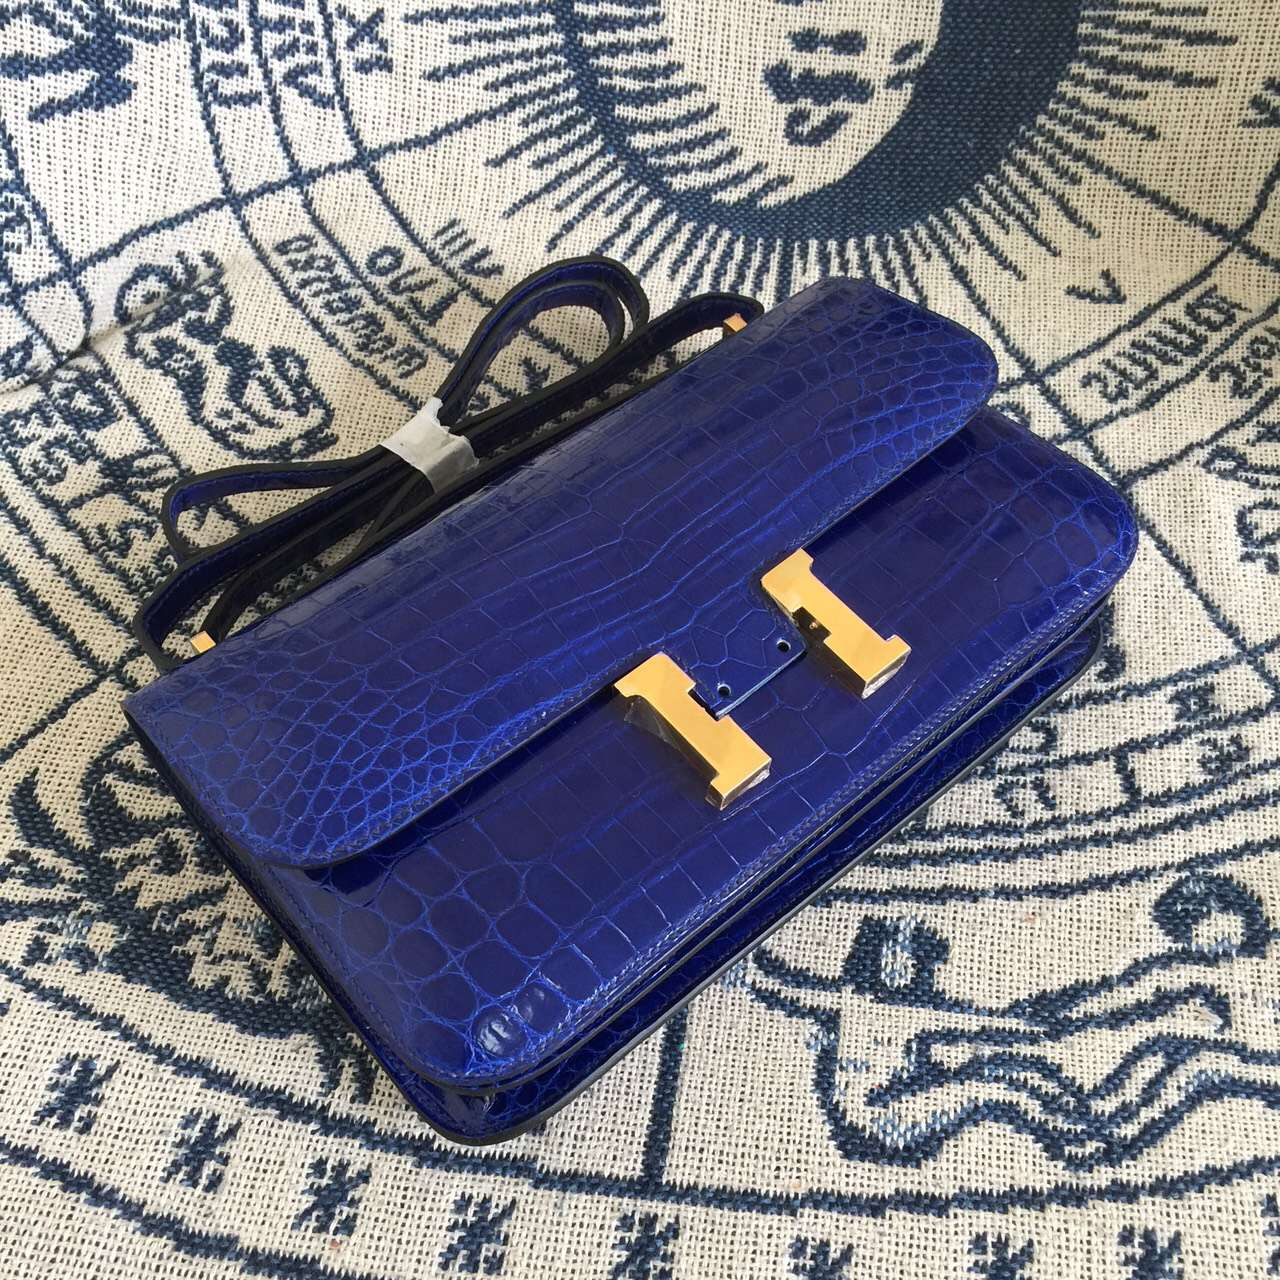 Cheap Hermes 7T Blue Electric Crocodile Skin Constance Bag 26CM